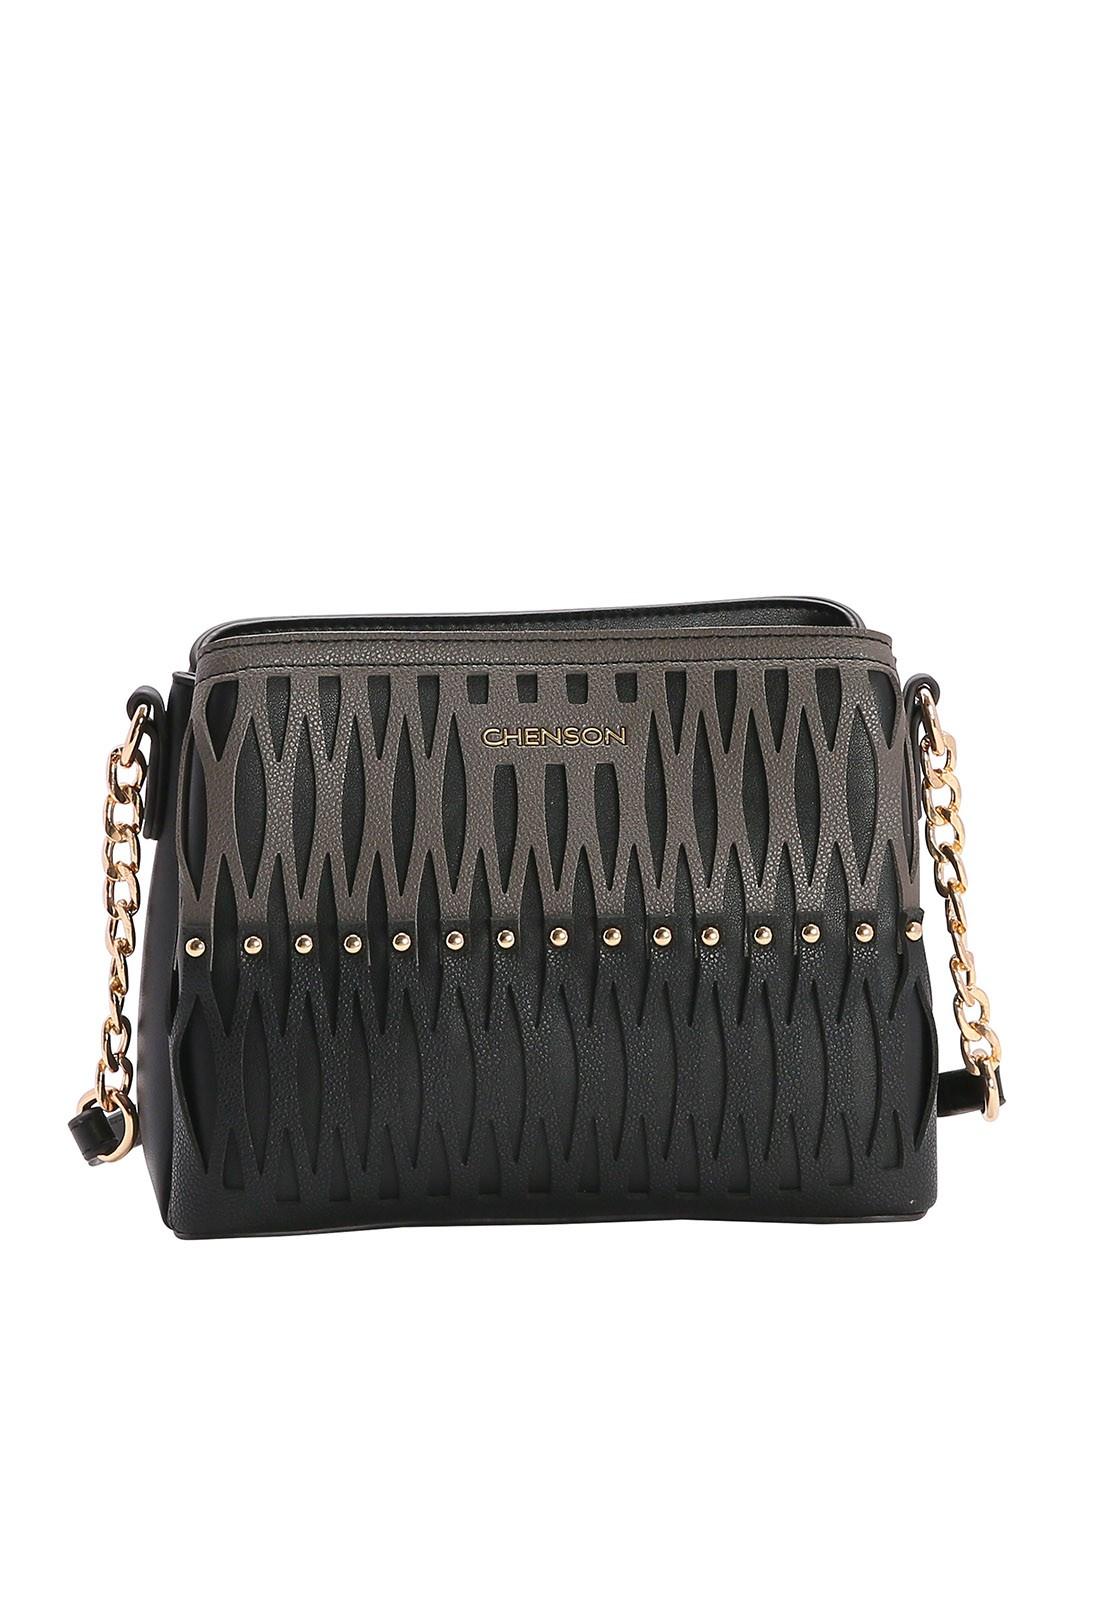 Bolsa Feminina Chenson Bicolor Transversal 3482992